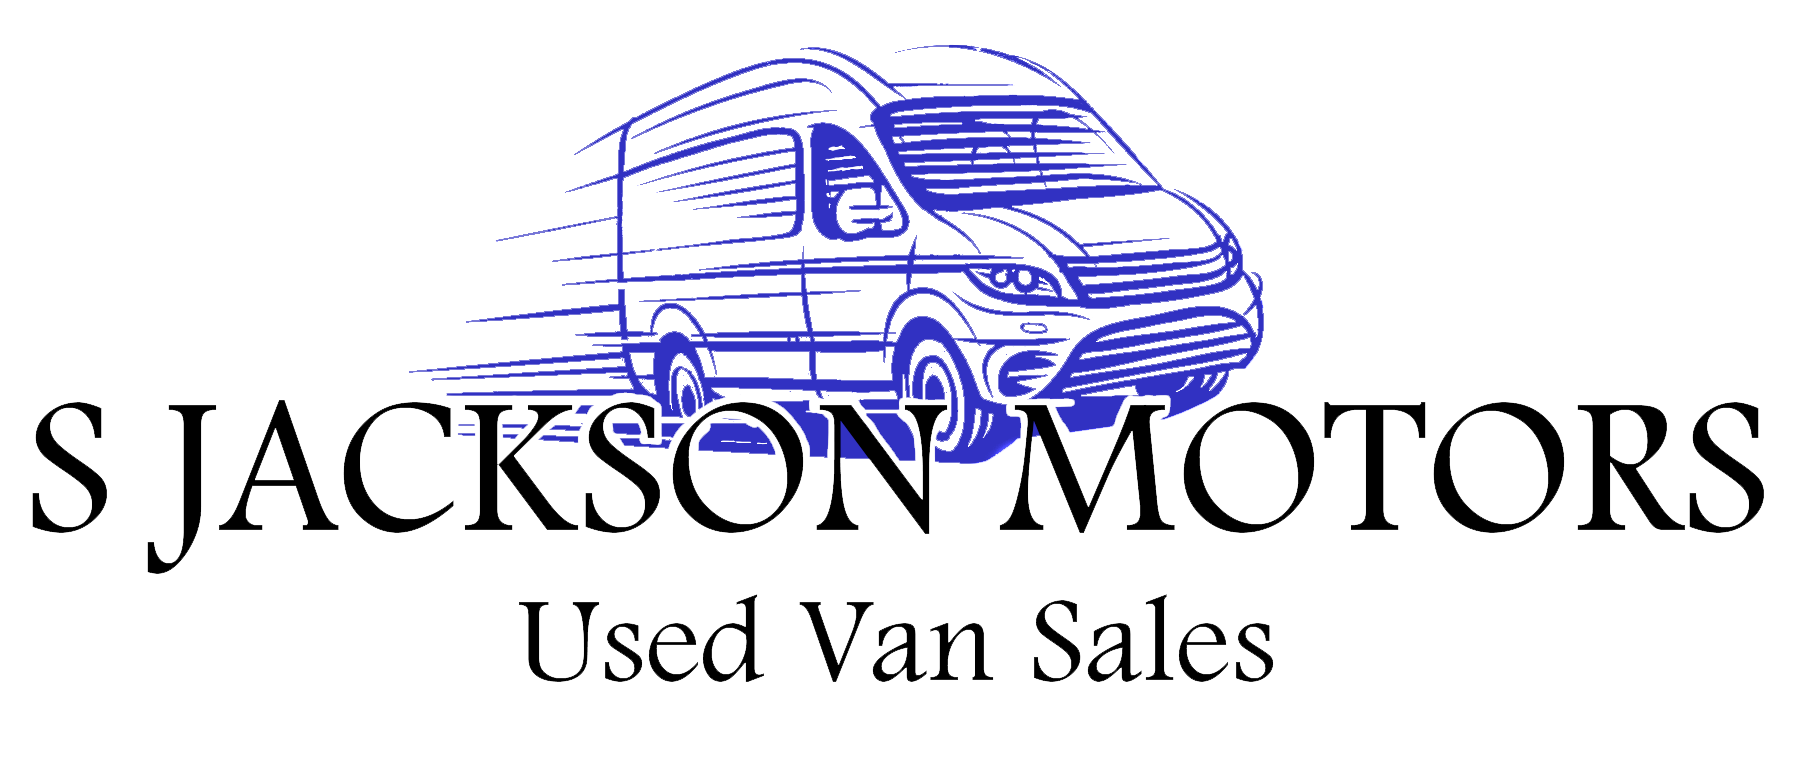 S Jackson Motors